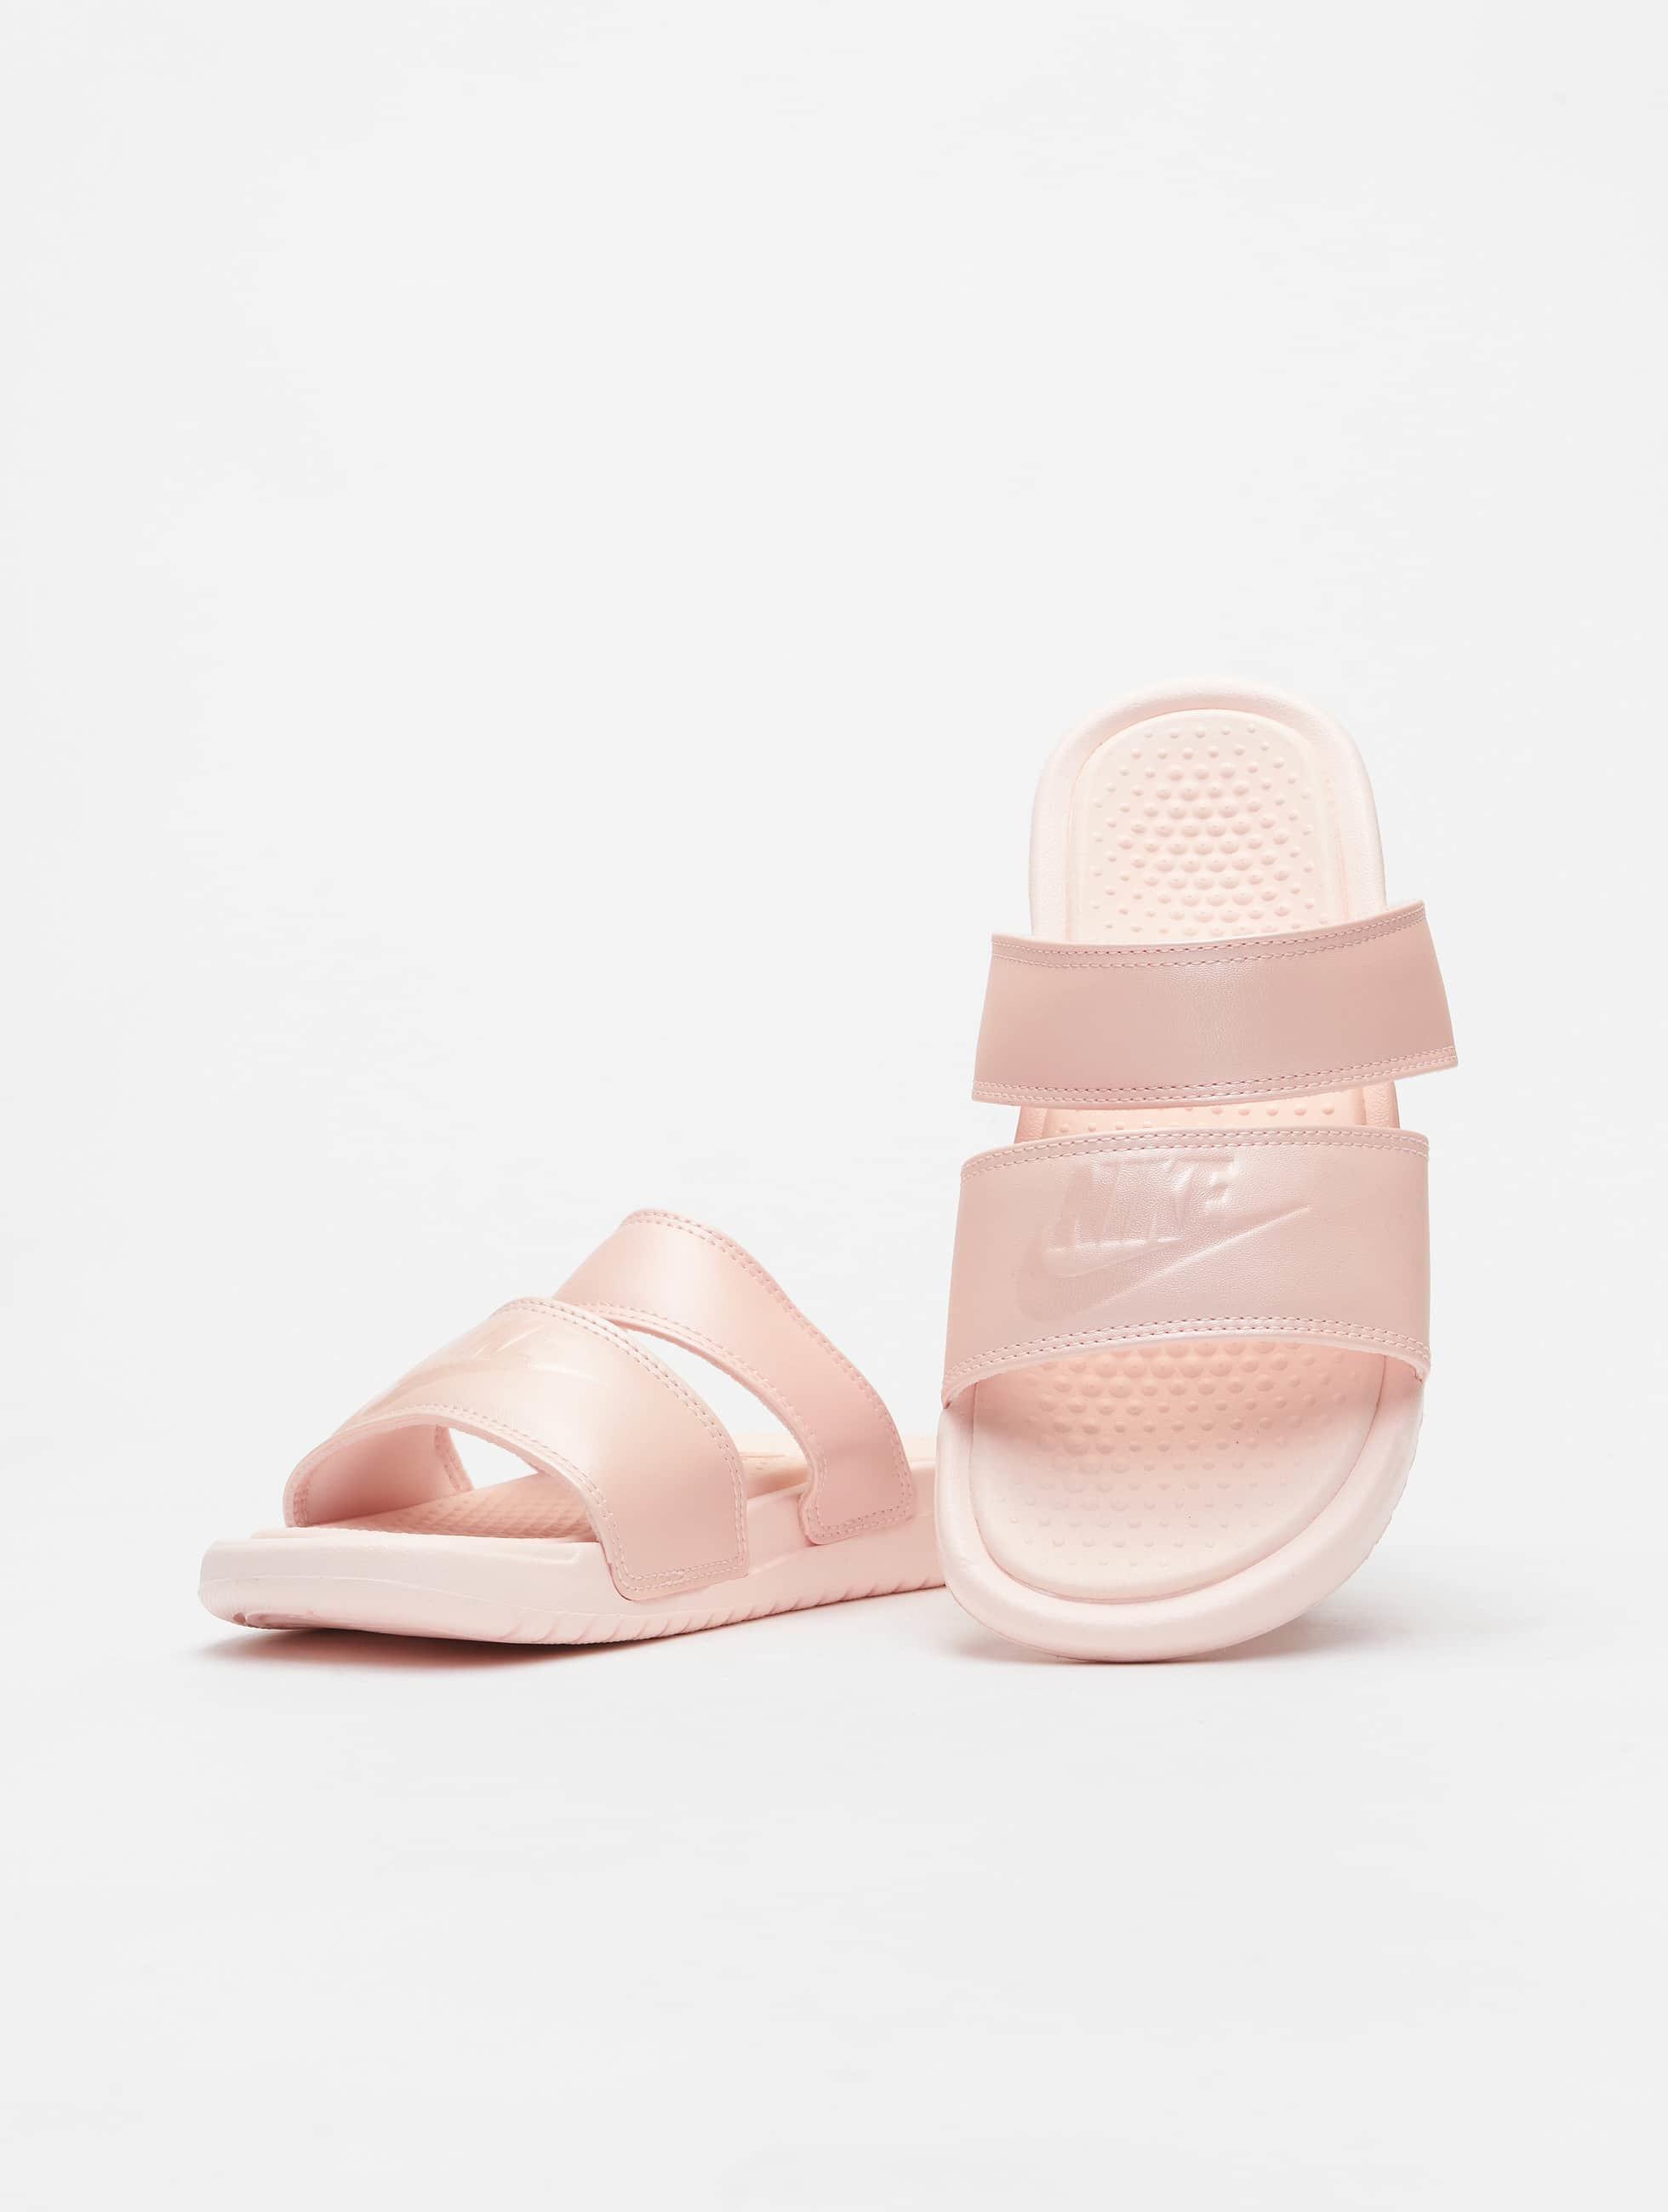 Nike Benassi Duo Ultra Slide Sandals Echo PinkEcho PinkEcho Pink